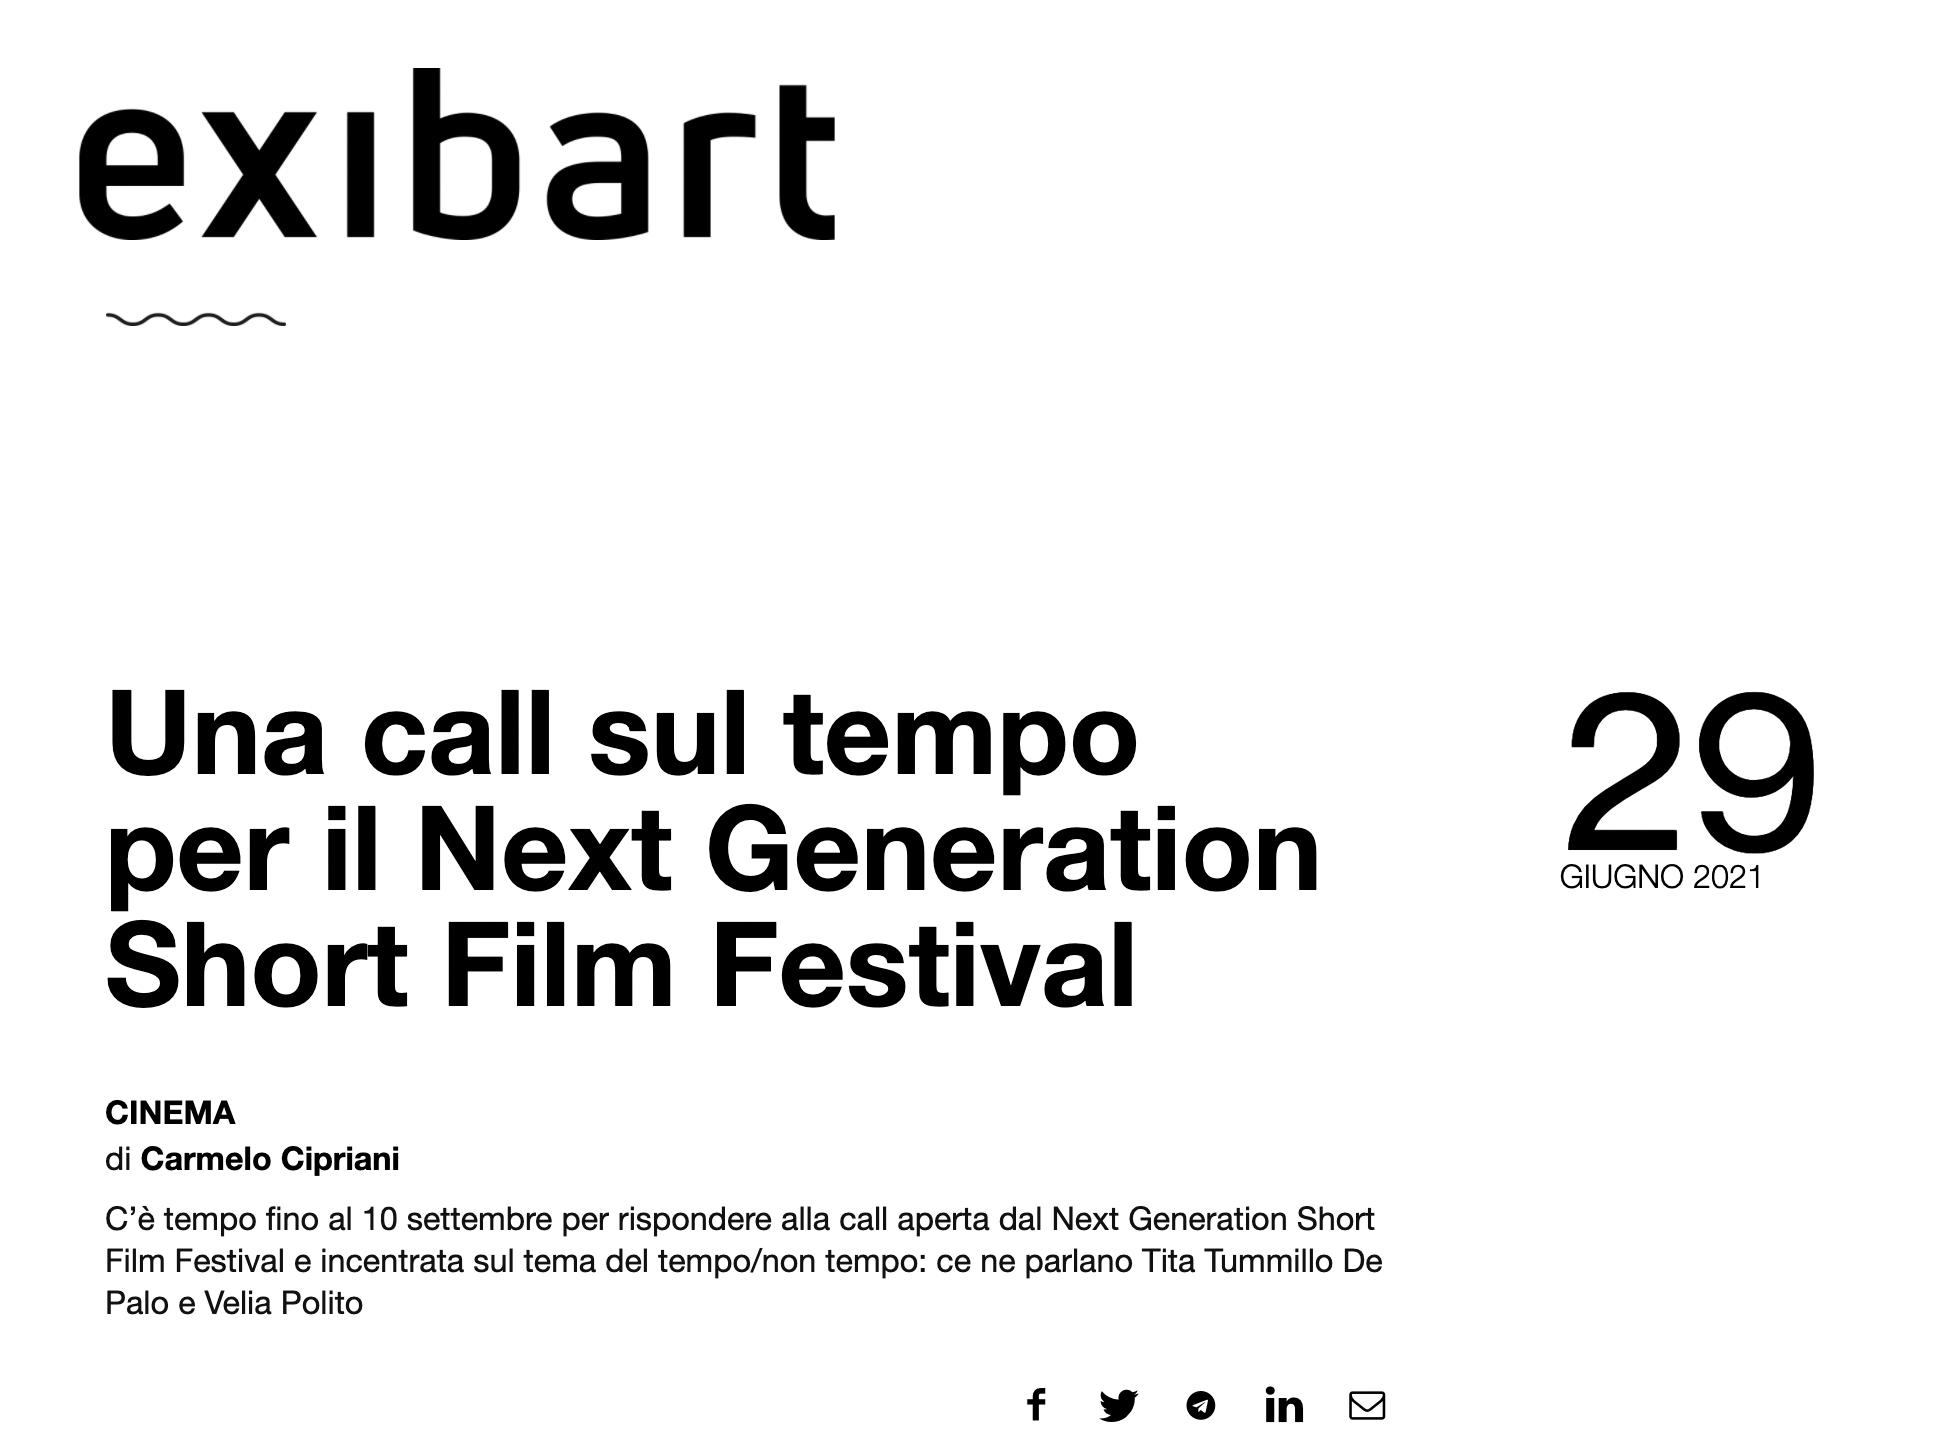 exibart_29-06-21